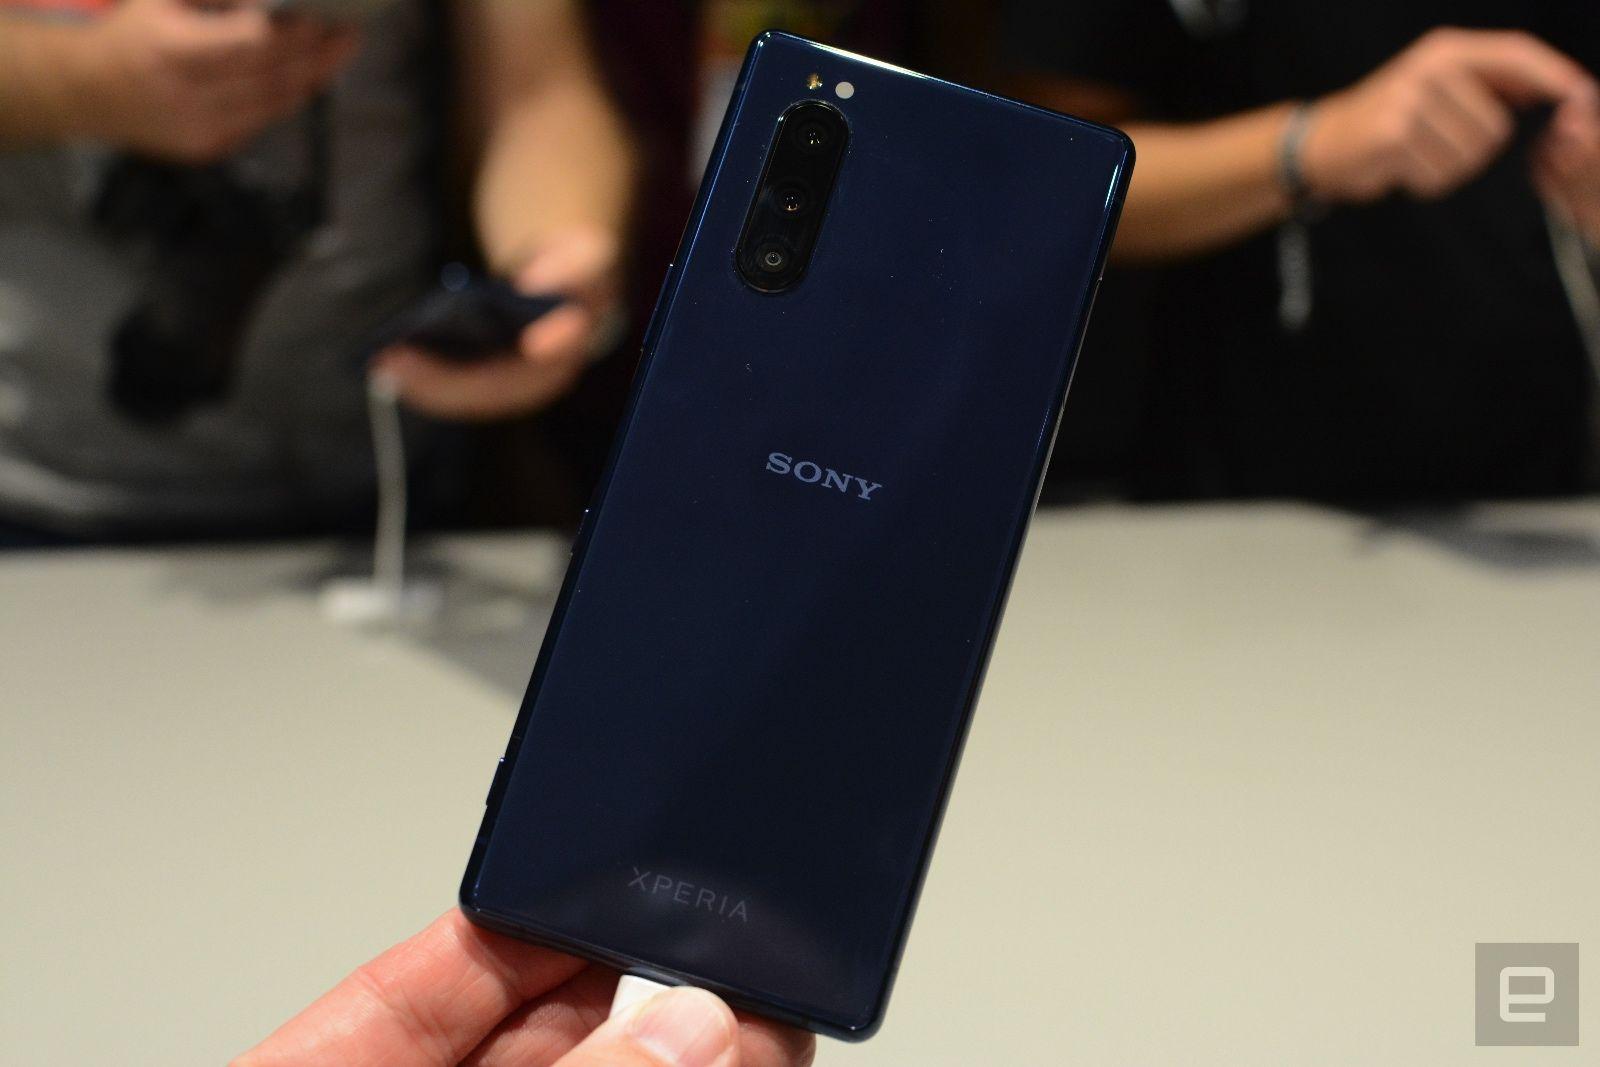 Sony Xperia 5 , Sony Xperia 5 Cam ,Sony Xperia 5 Camera test,Sony Xperia 5 Screen Repair, Sony Xperia 5 Camera, Sony Xperia 5 Unboxing, Sony Xperia 5 Hands-on